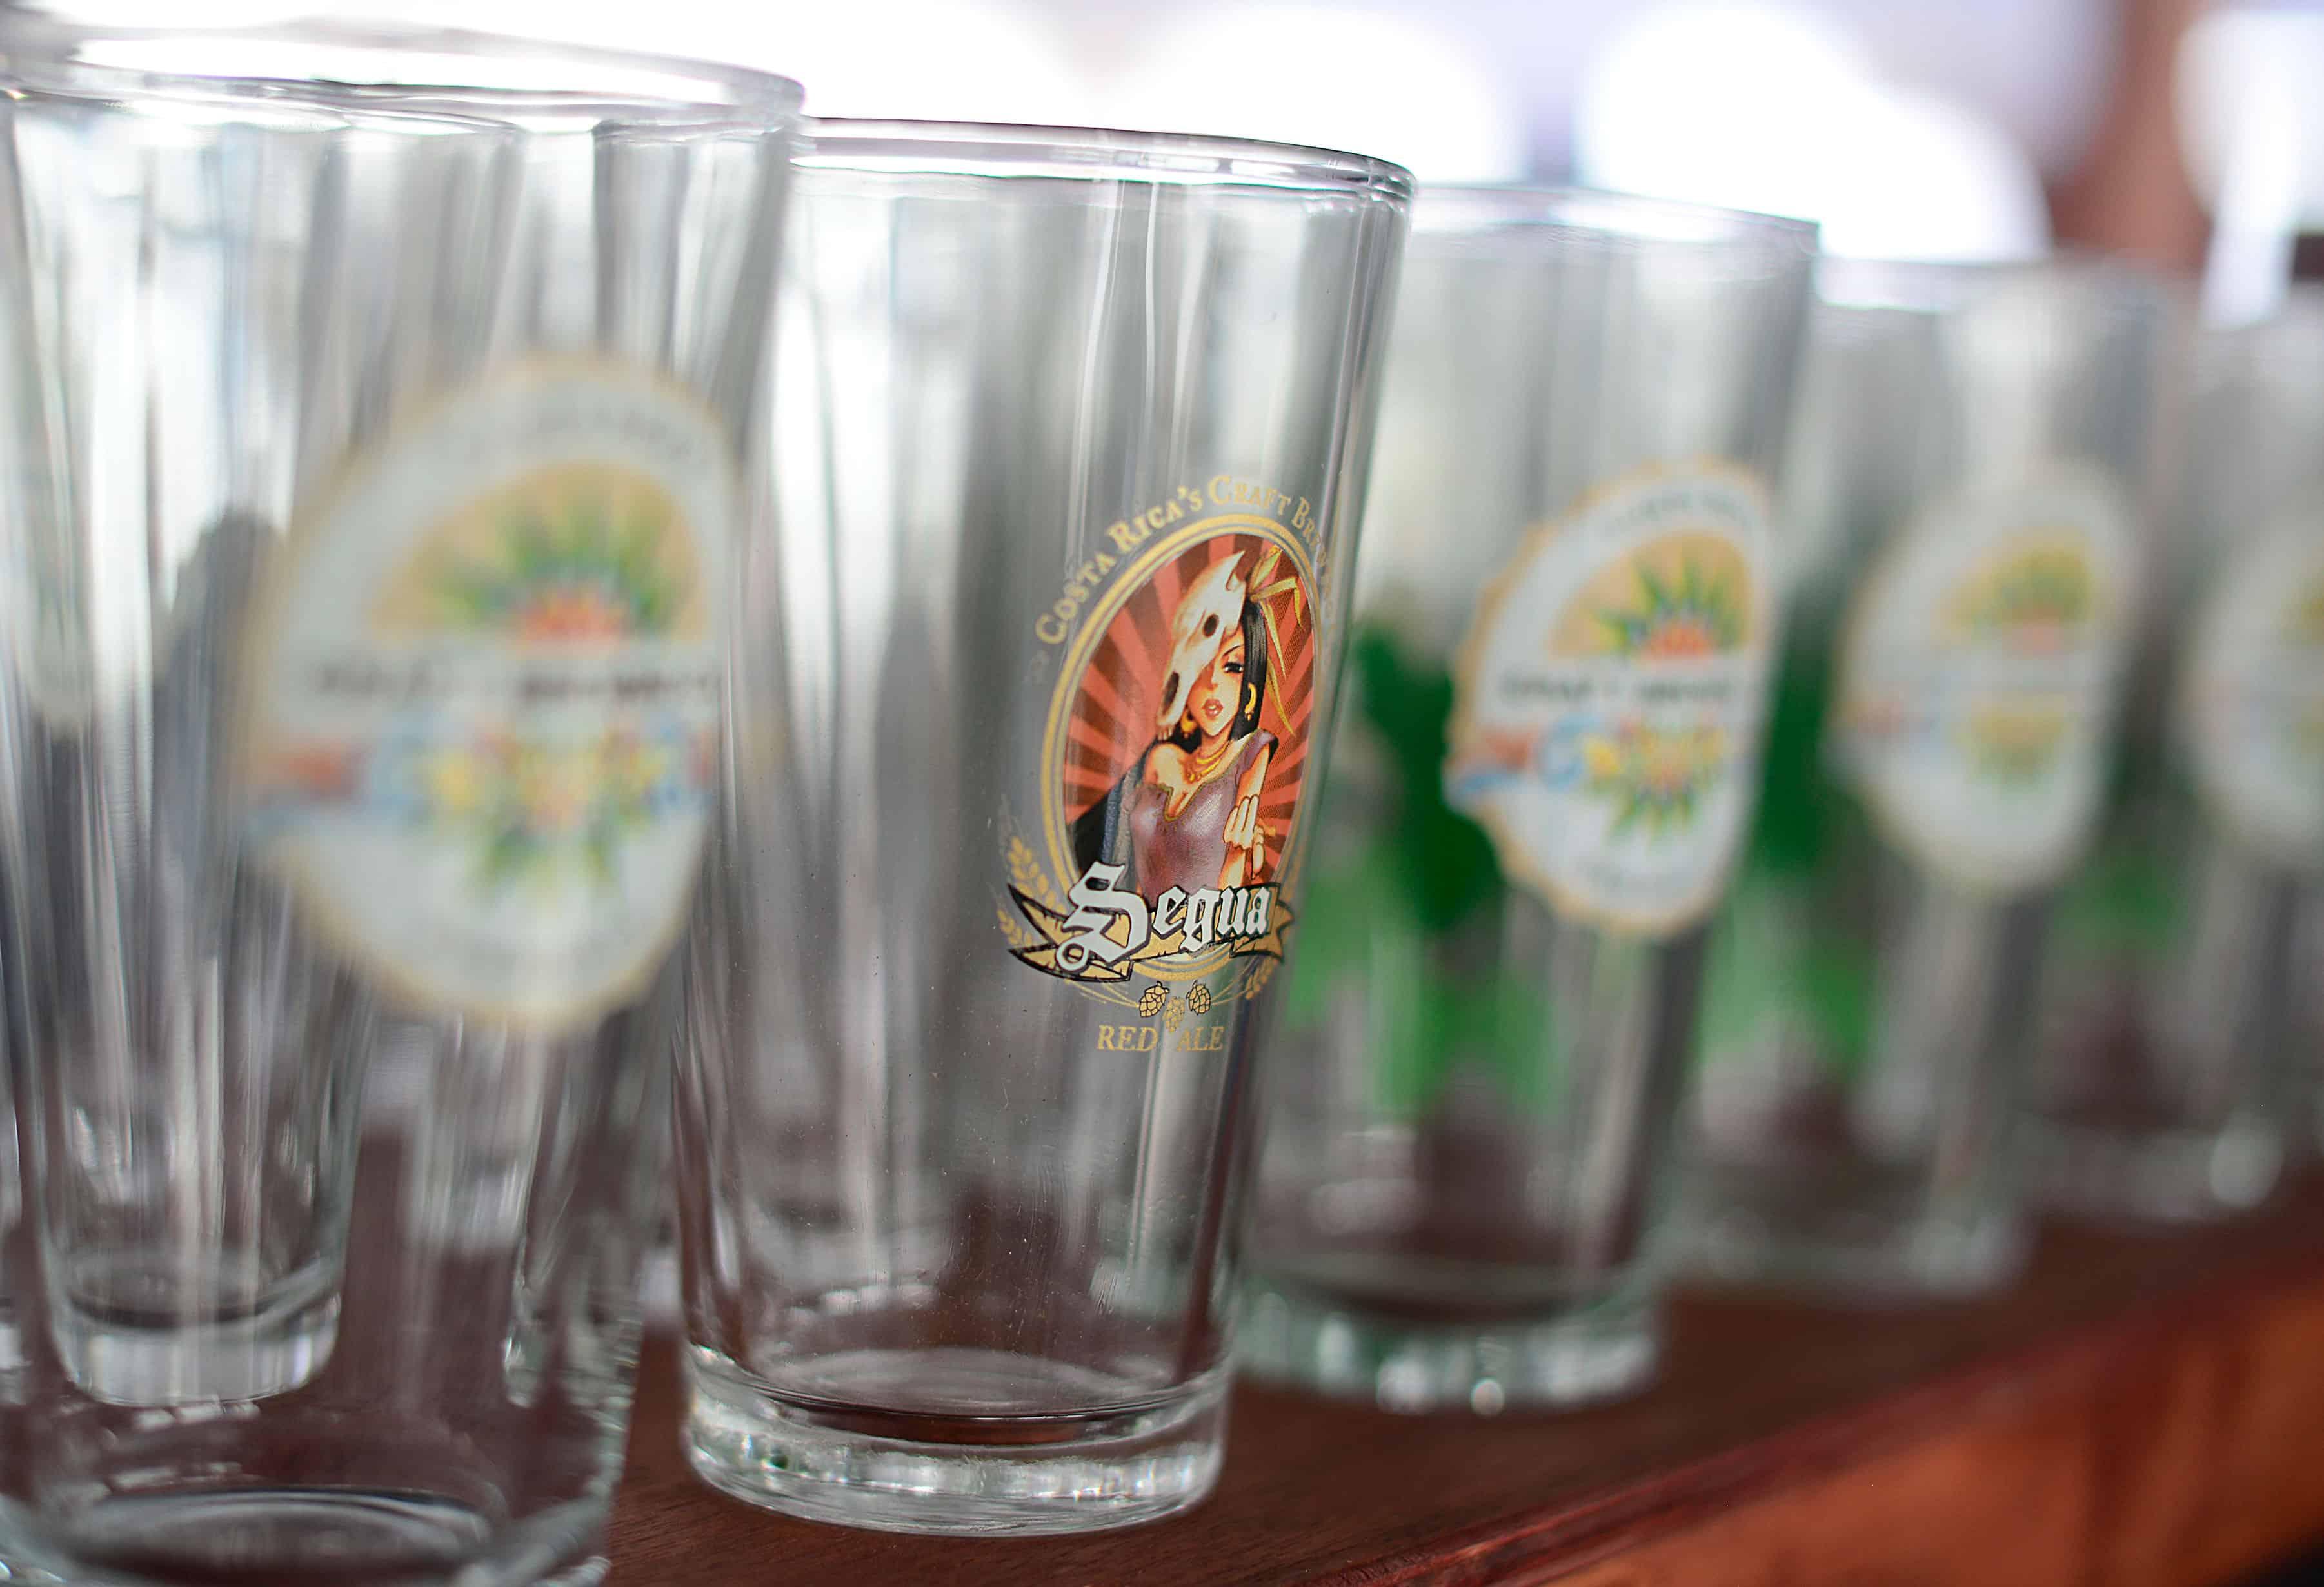 Segua beer glass